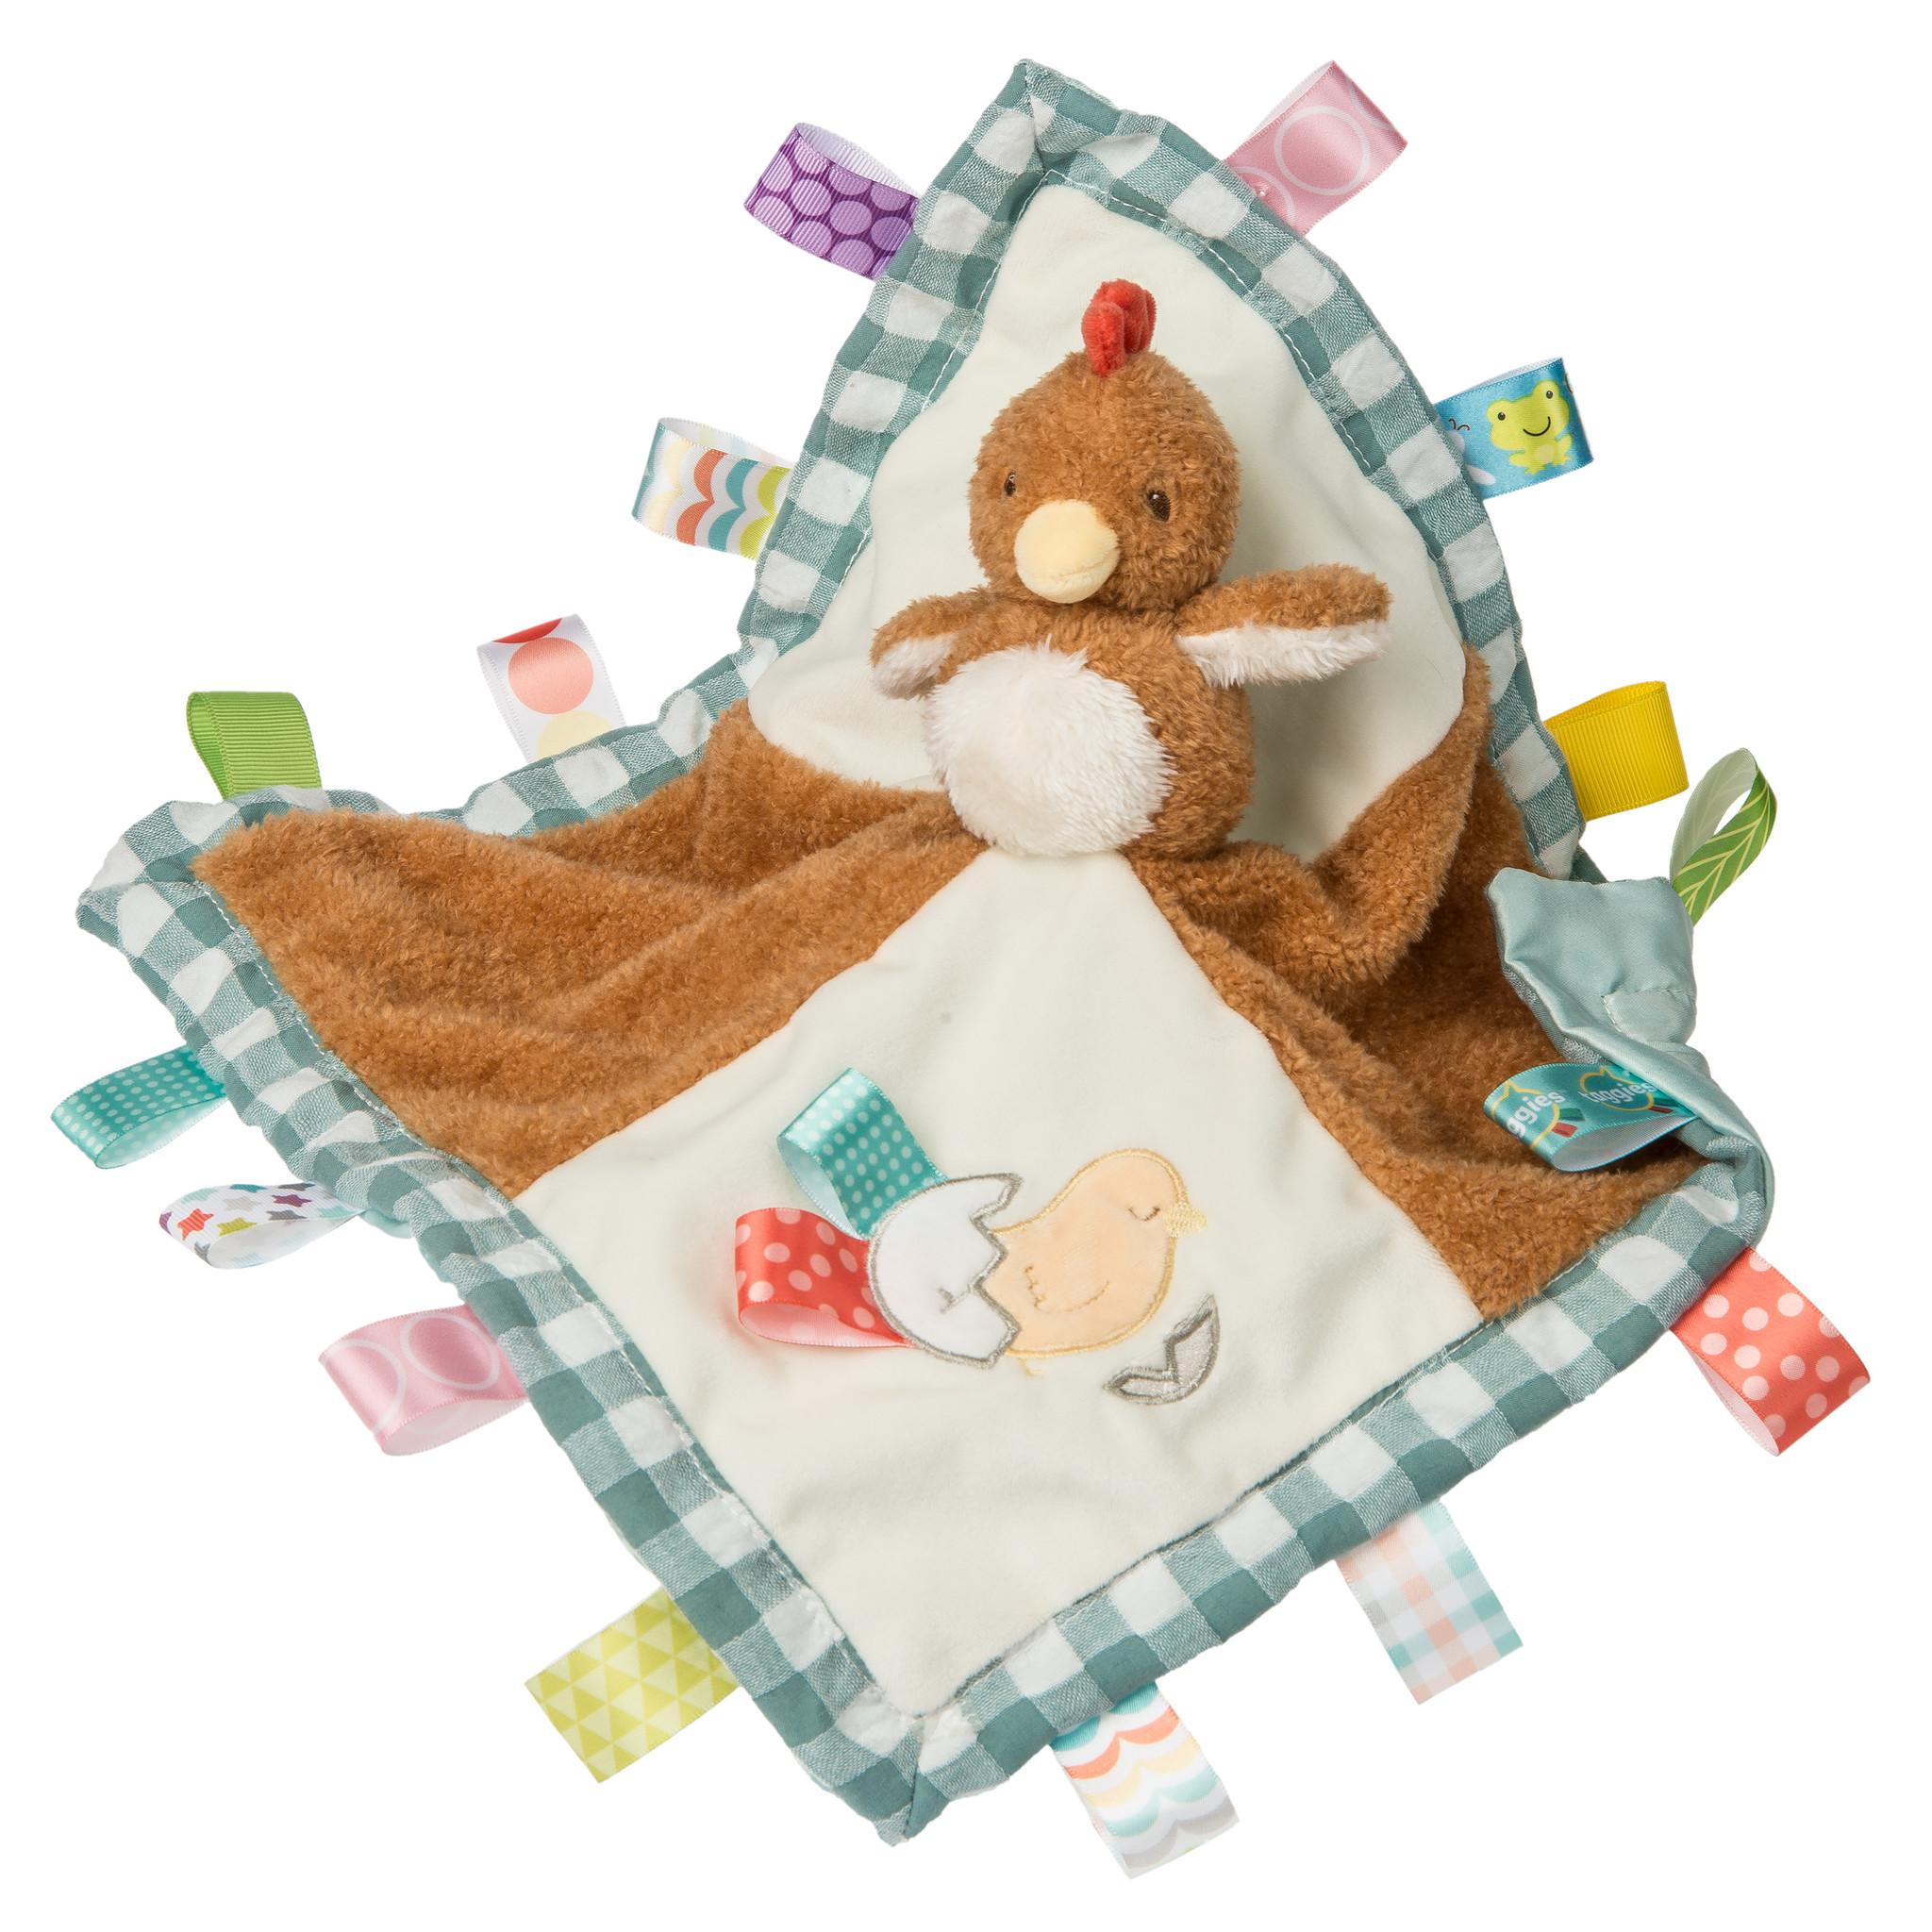 Taggies Taggies Character Blanket